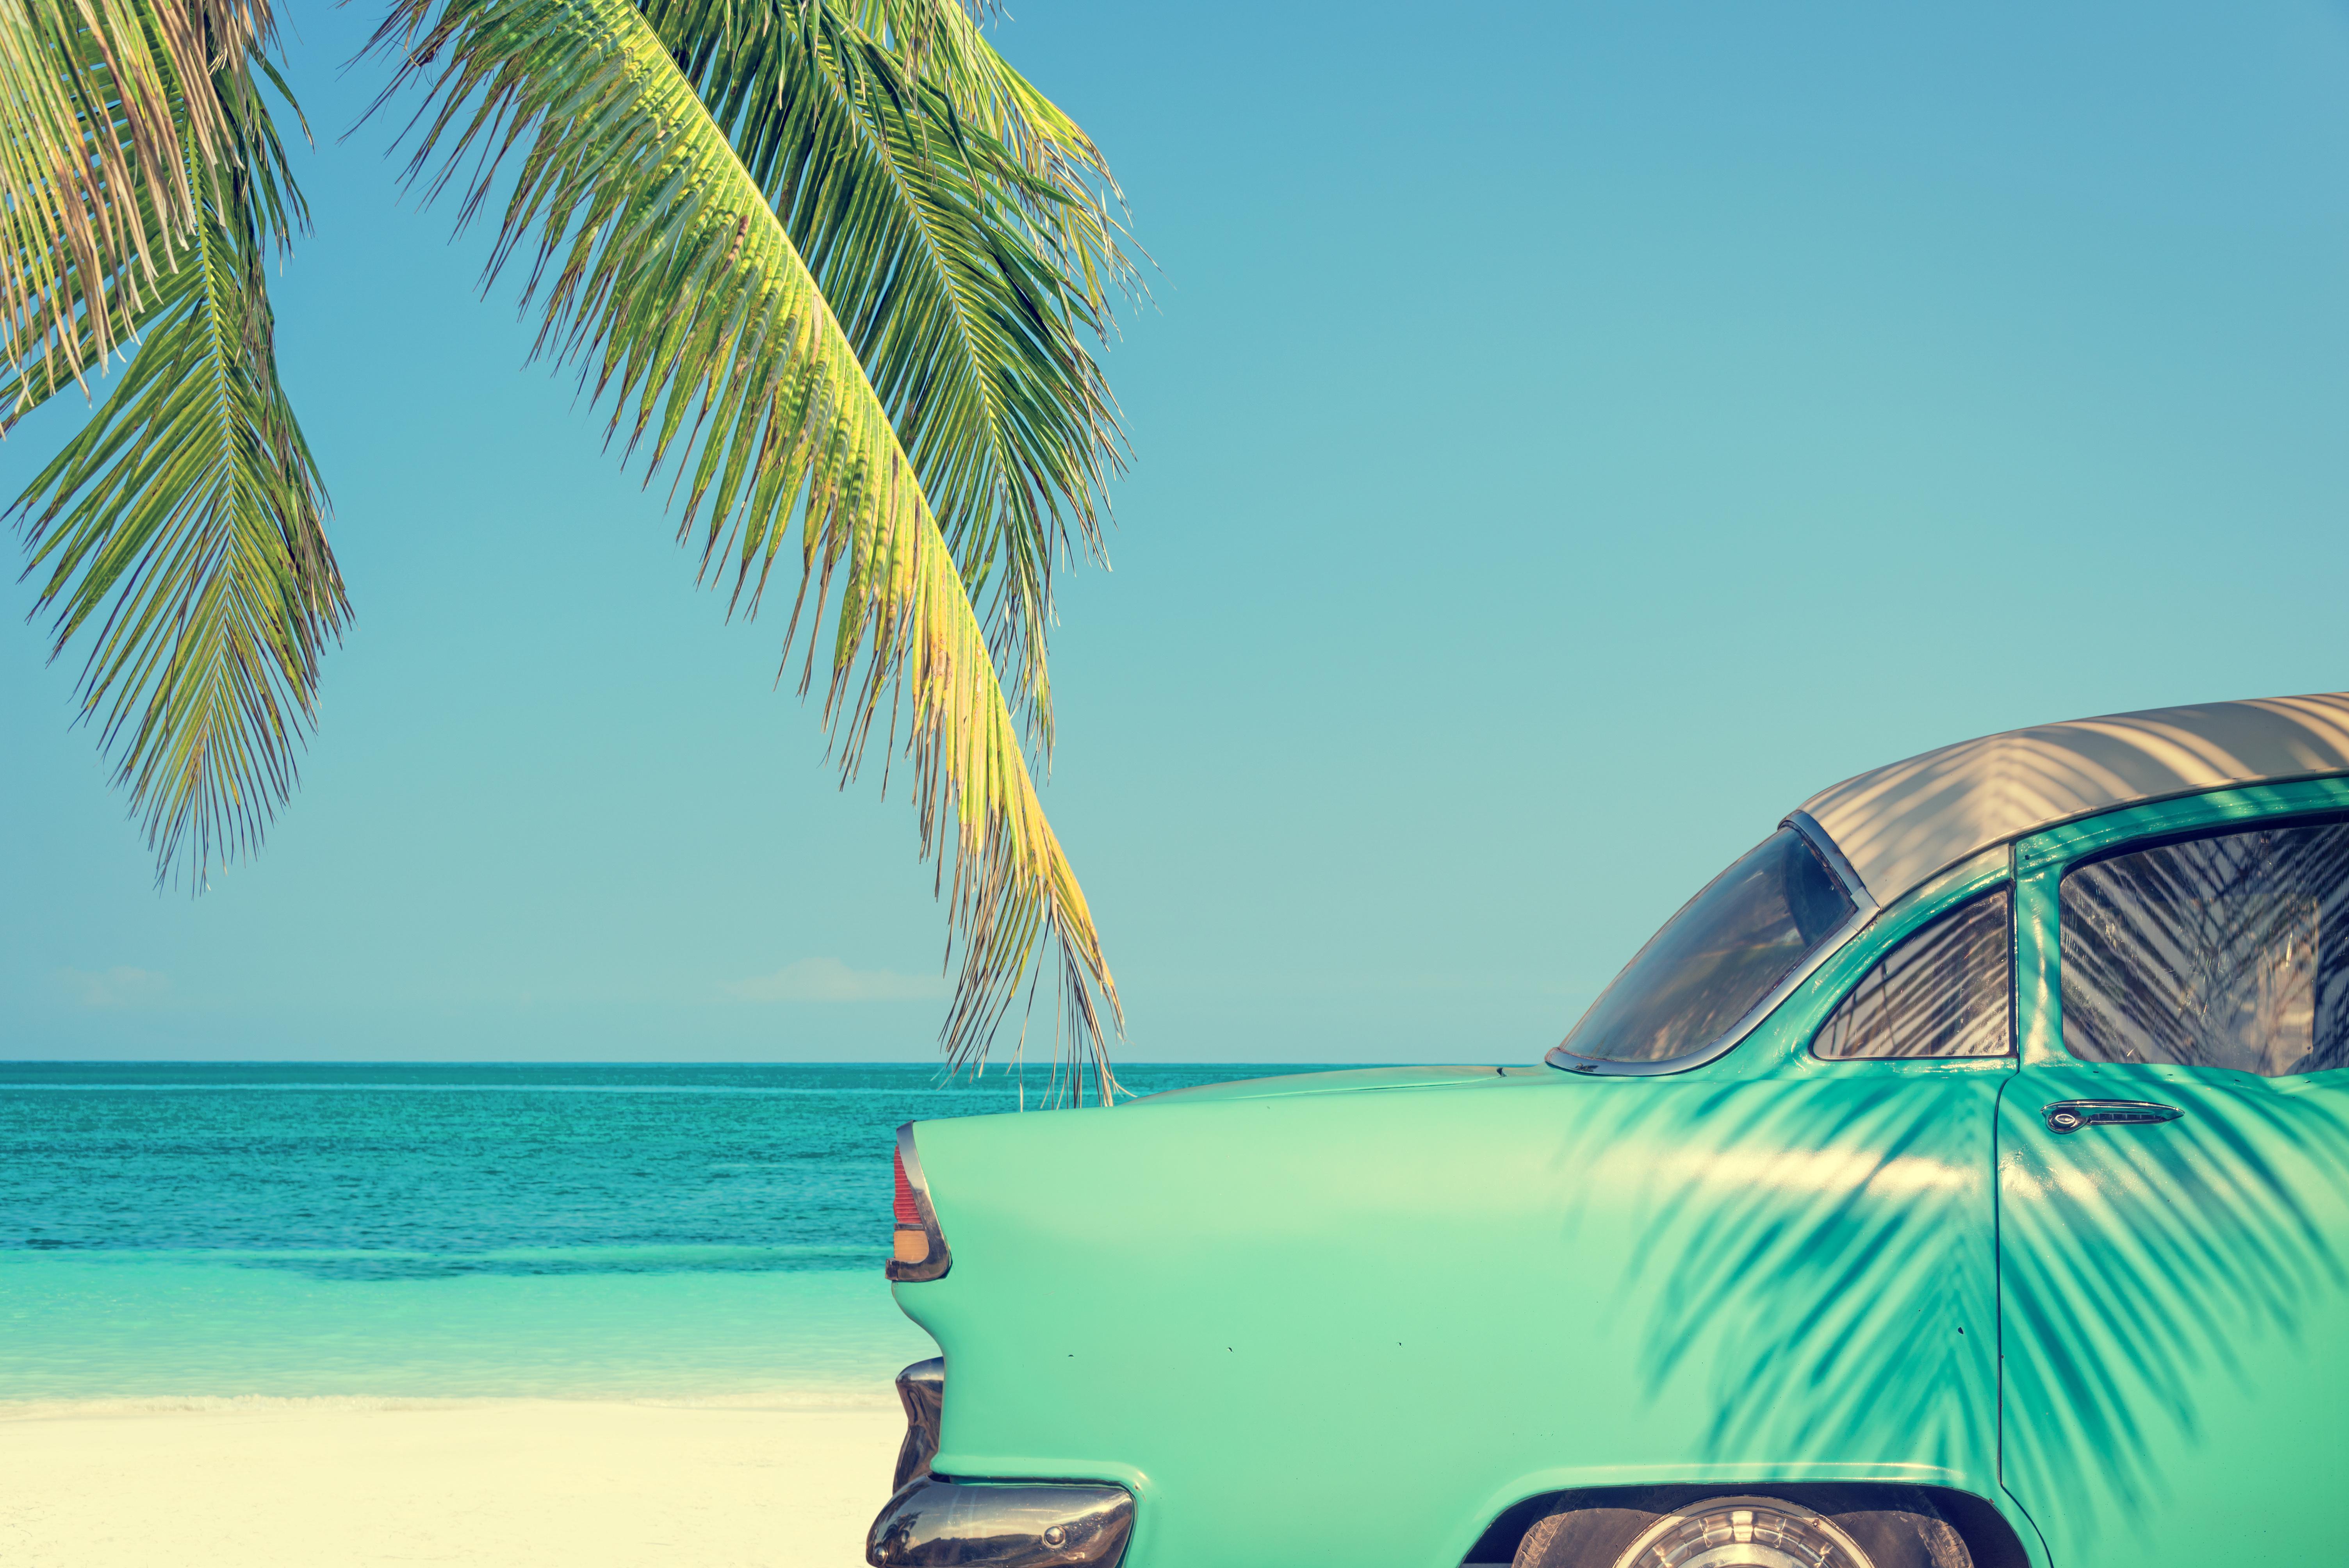 /optitravel/online/www/layout22/single_product.php?pkt_id=356&Produto=O Melhor de Cuba & Cayo Santa Maria&destino=CUBA